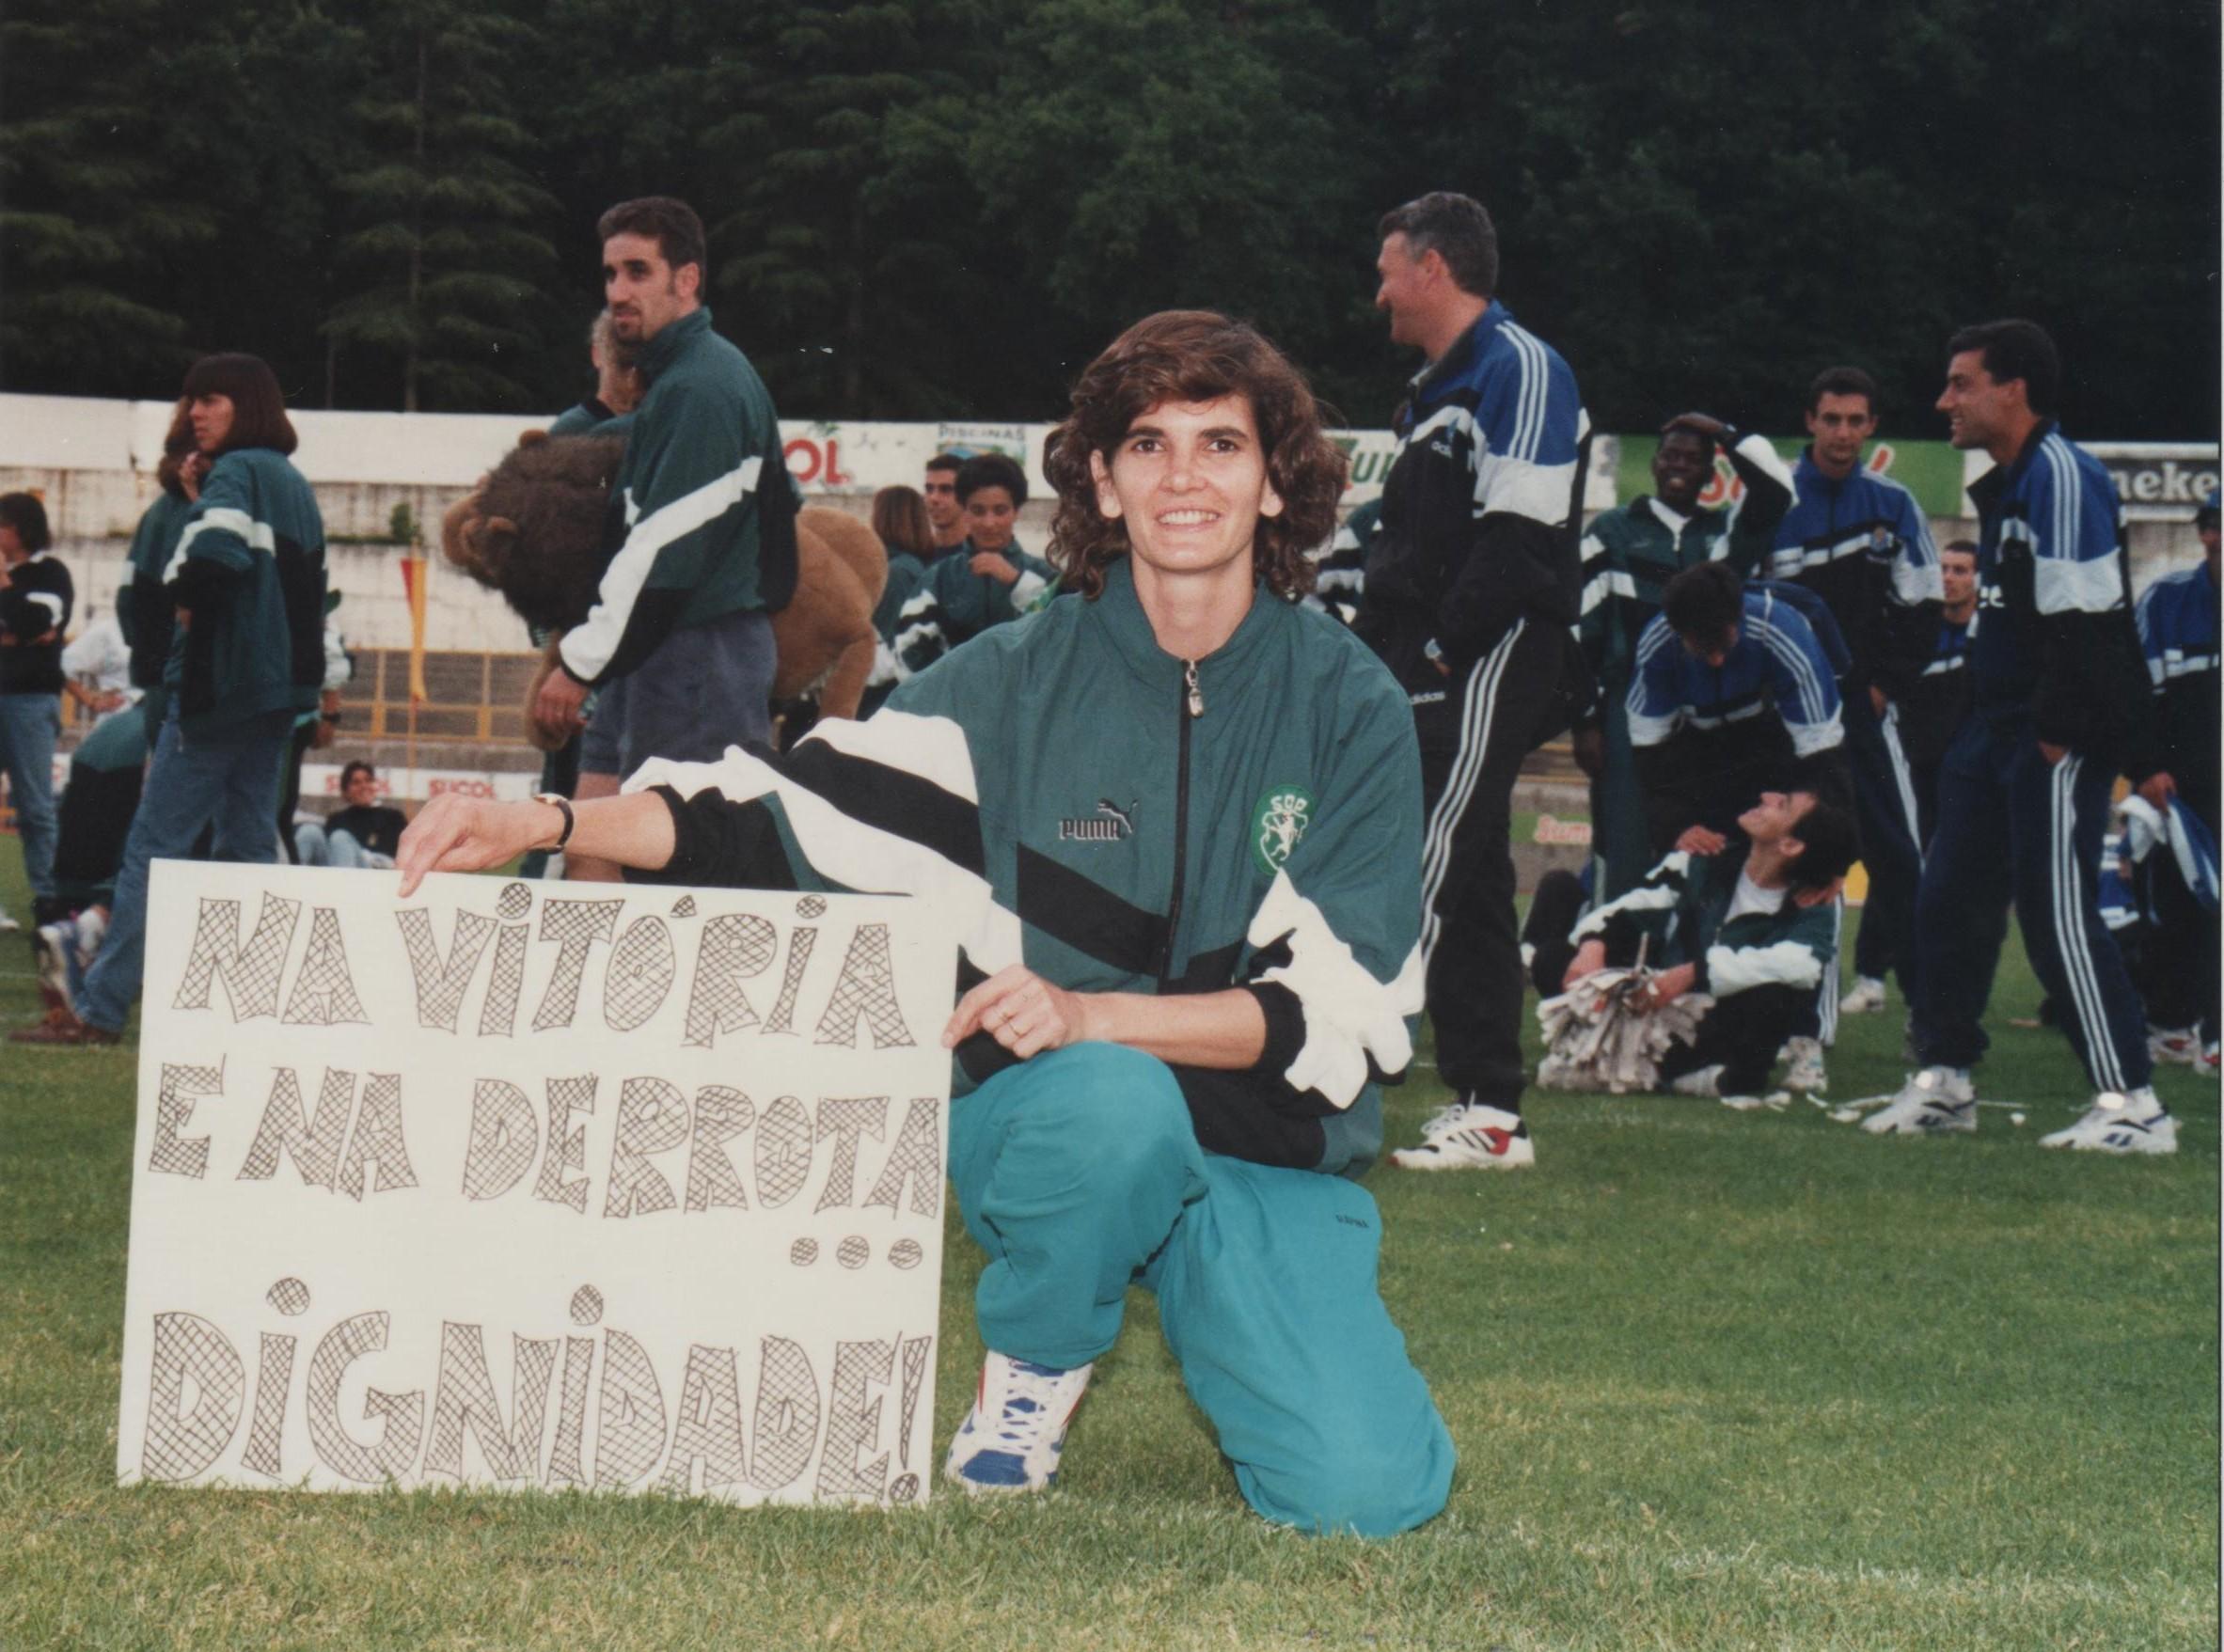 Maria José-Sempre foi o meu lema - Tratada